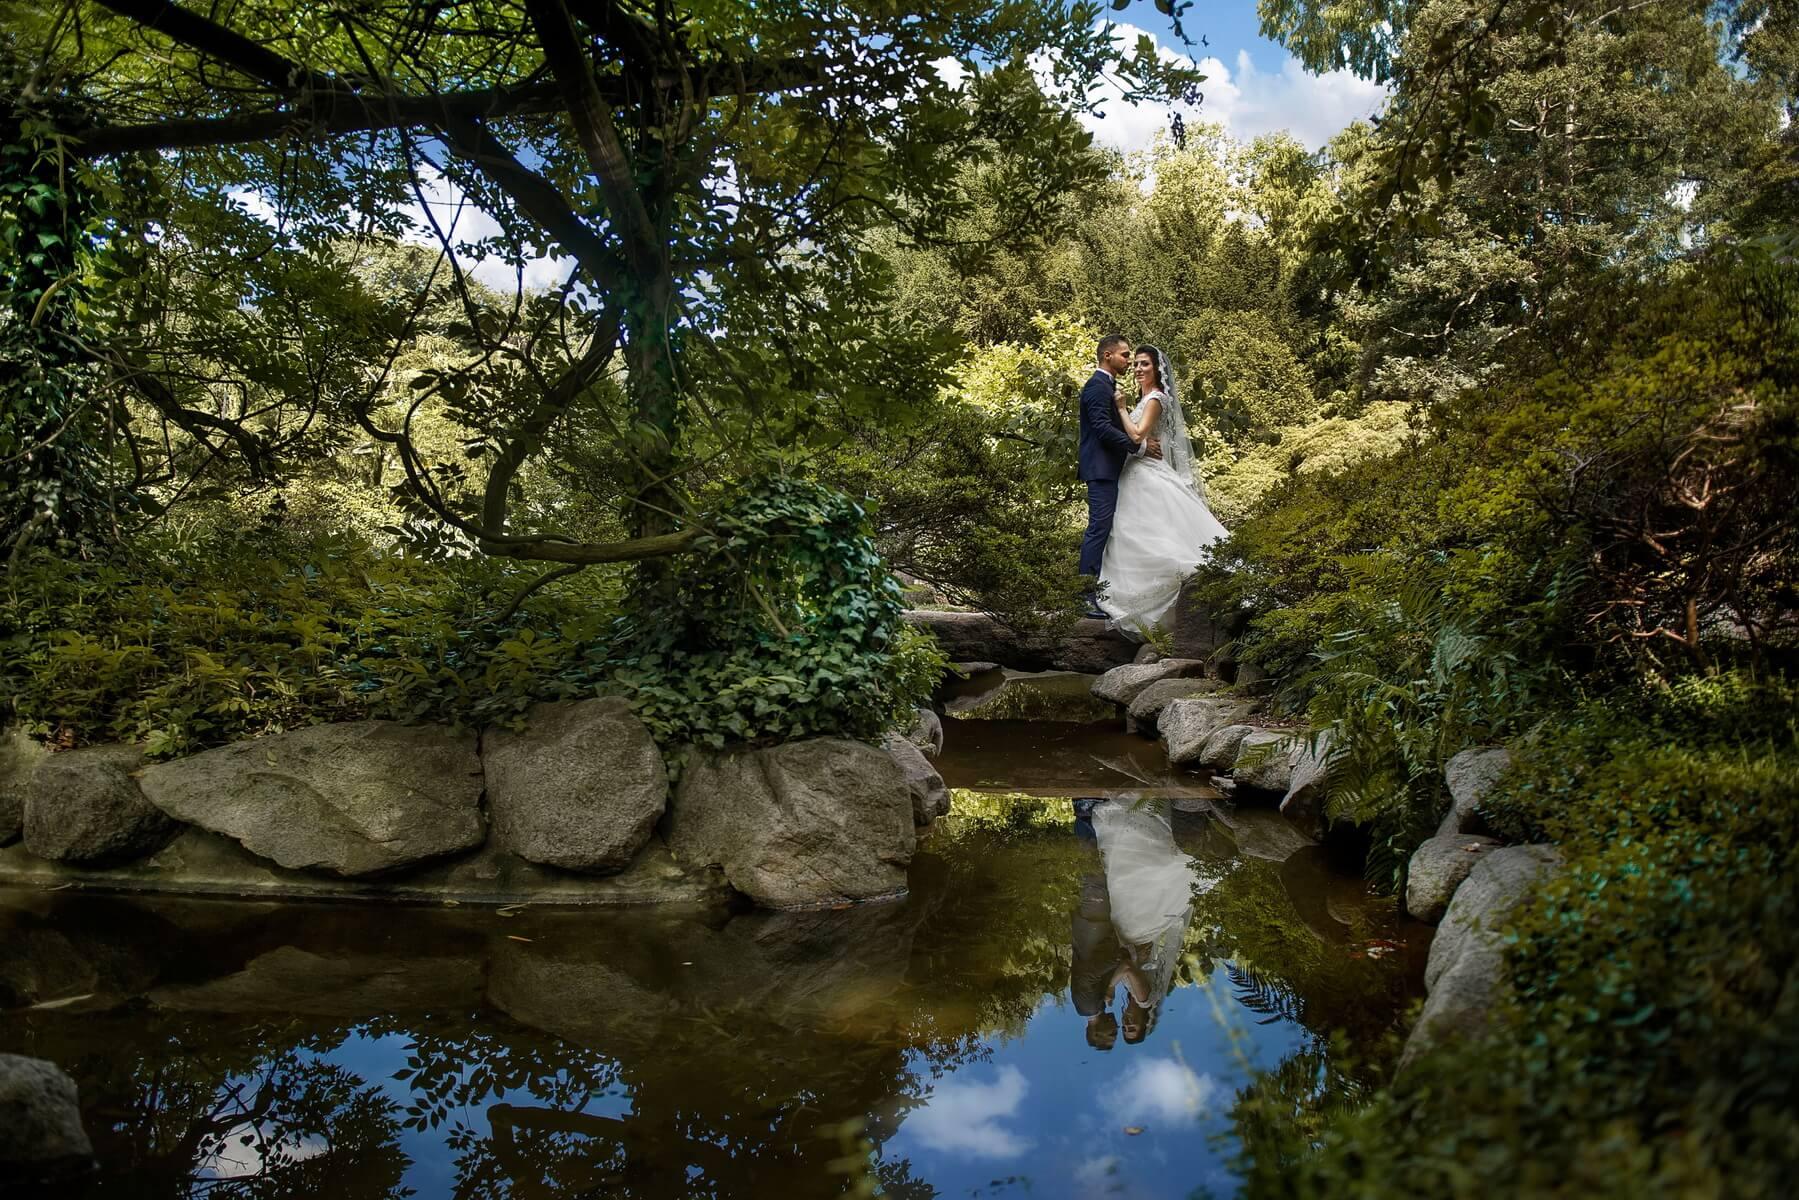 Hochzeitsfotograf-Frankfurt-Natur-Brautpaar-Shooting